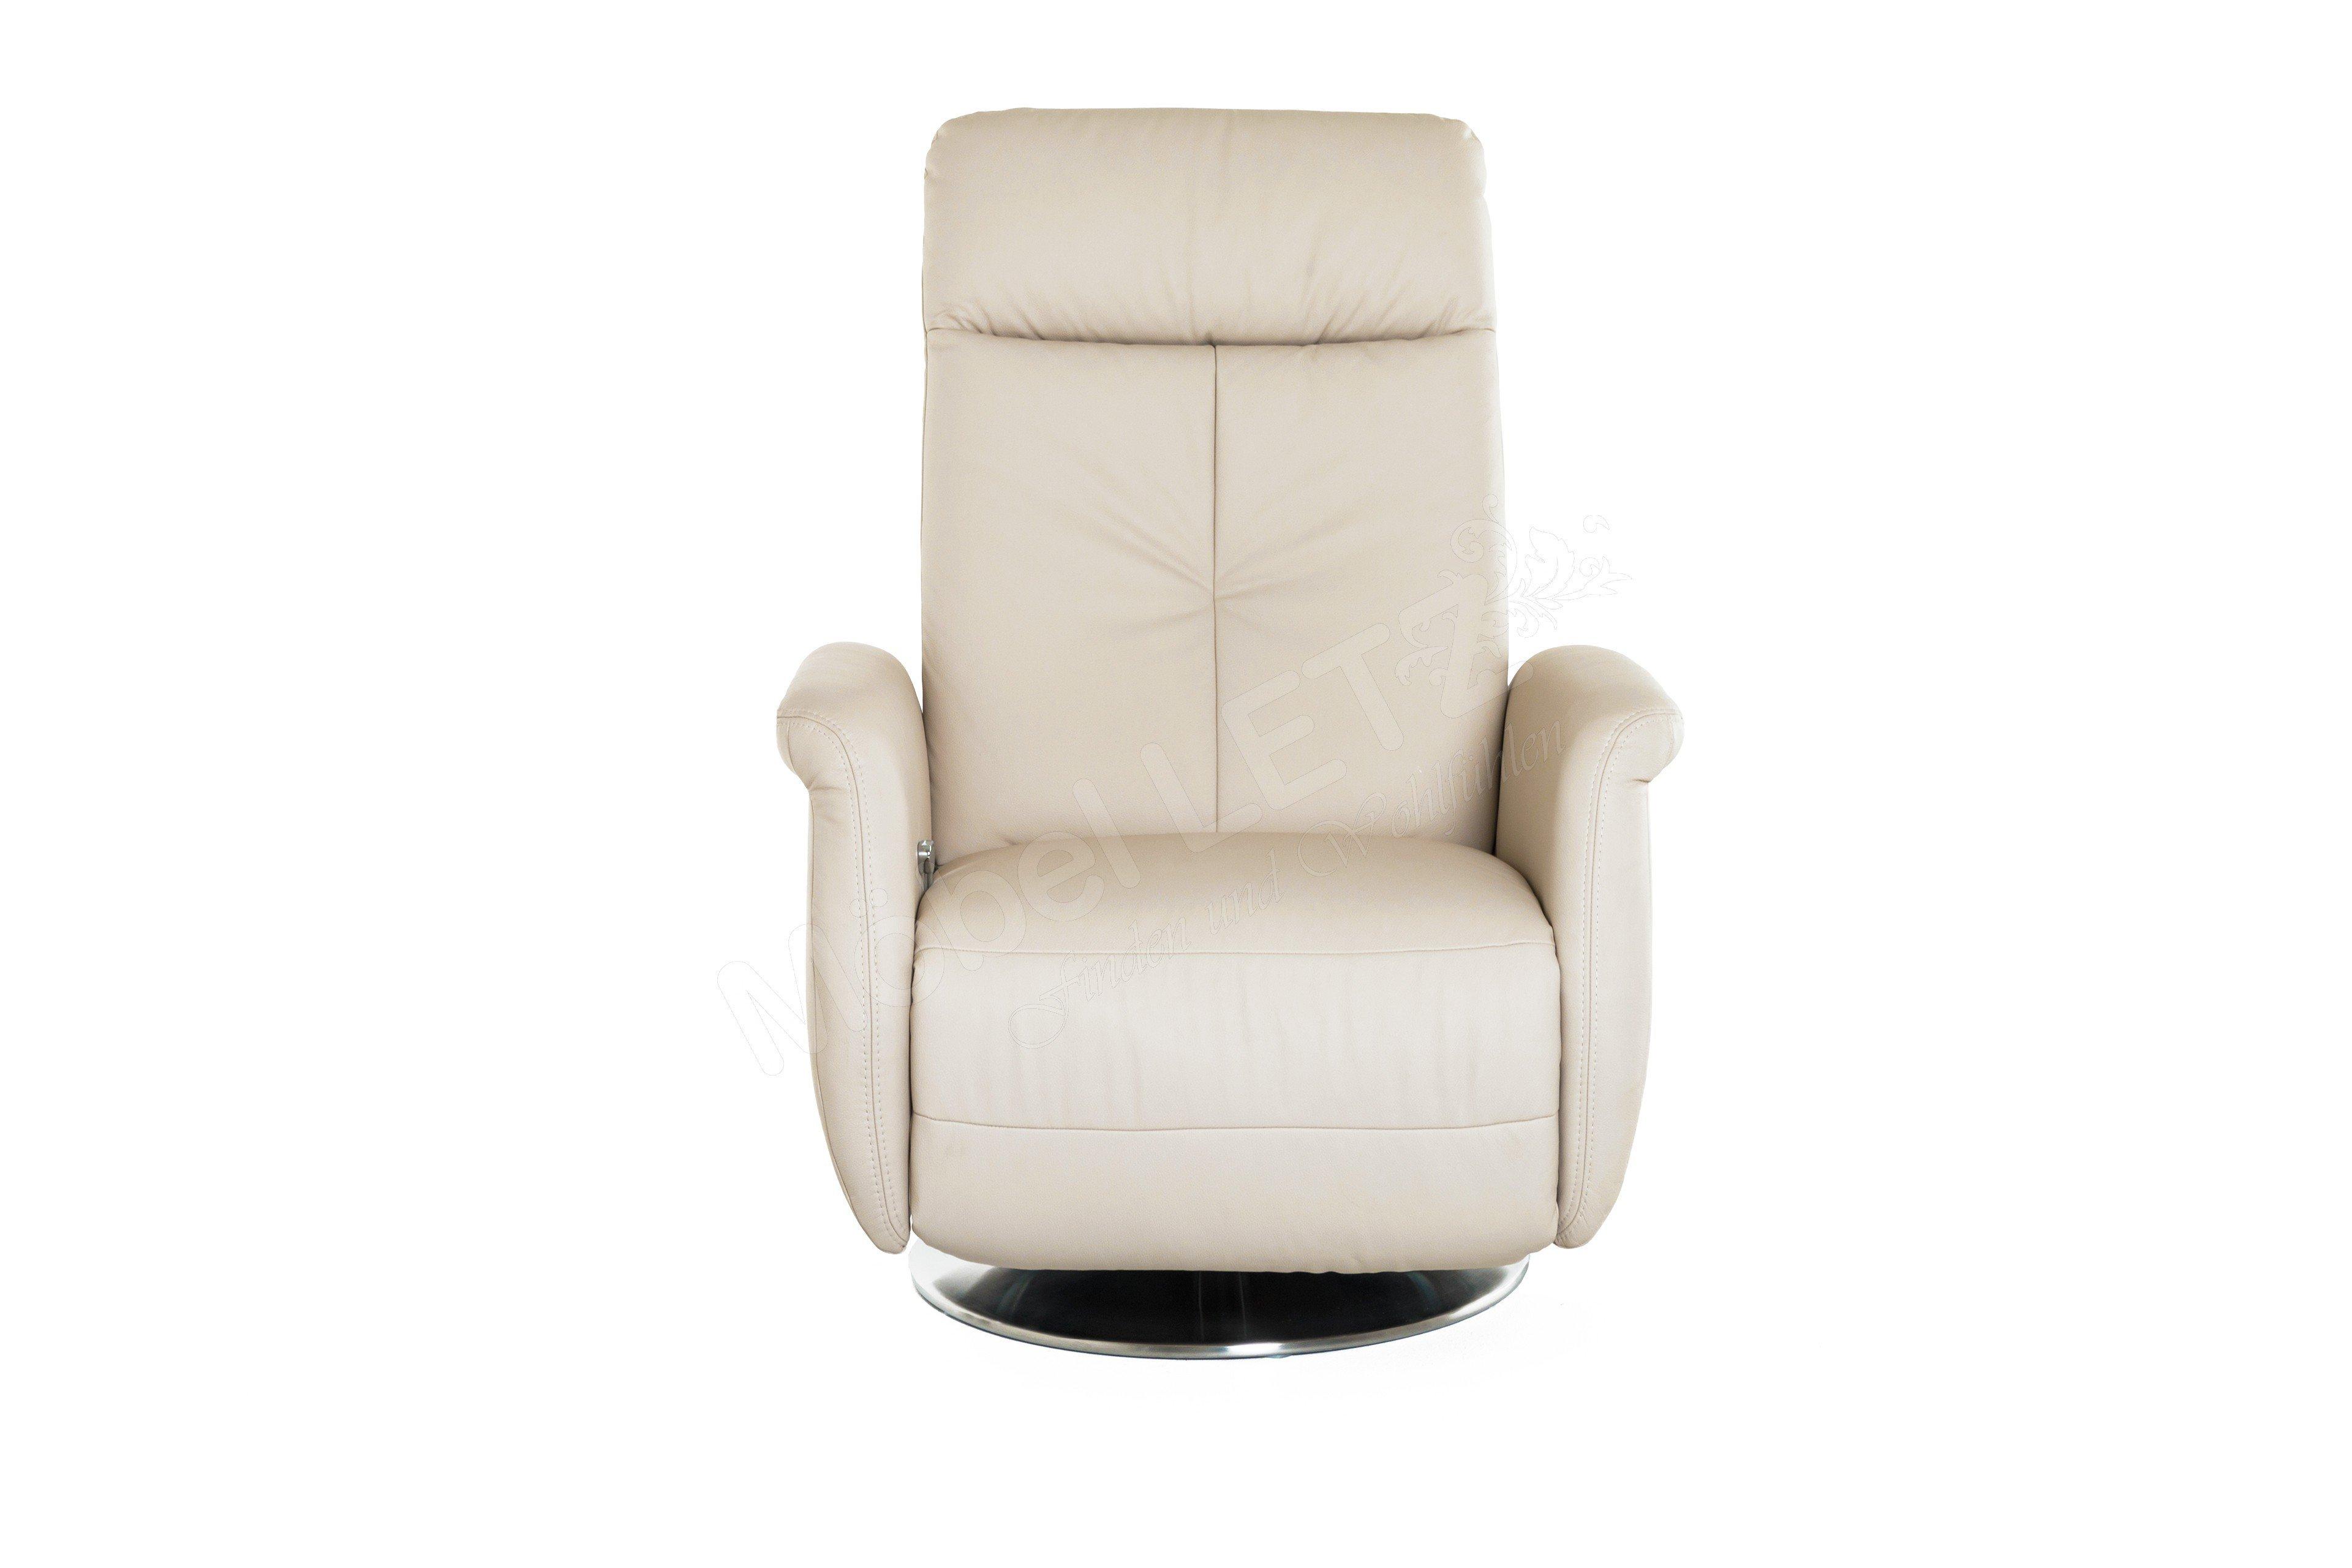 polinova polsterm bel waveline relaxsessel beige m bel letz ihr online shop. Black Bedroom Furniture Sets. Home Design Ideas